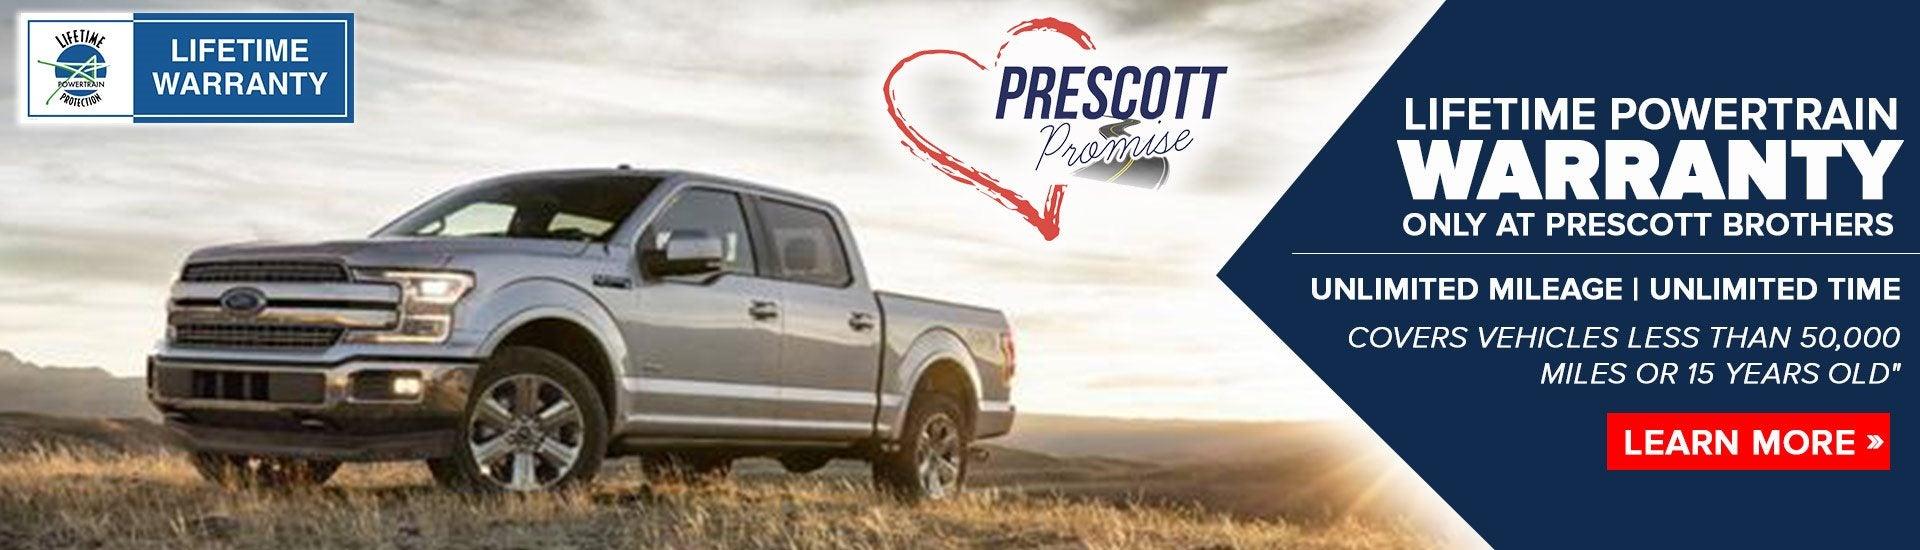 Prescott Promise